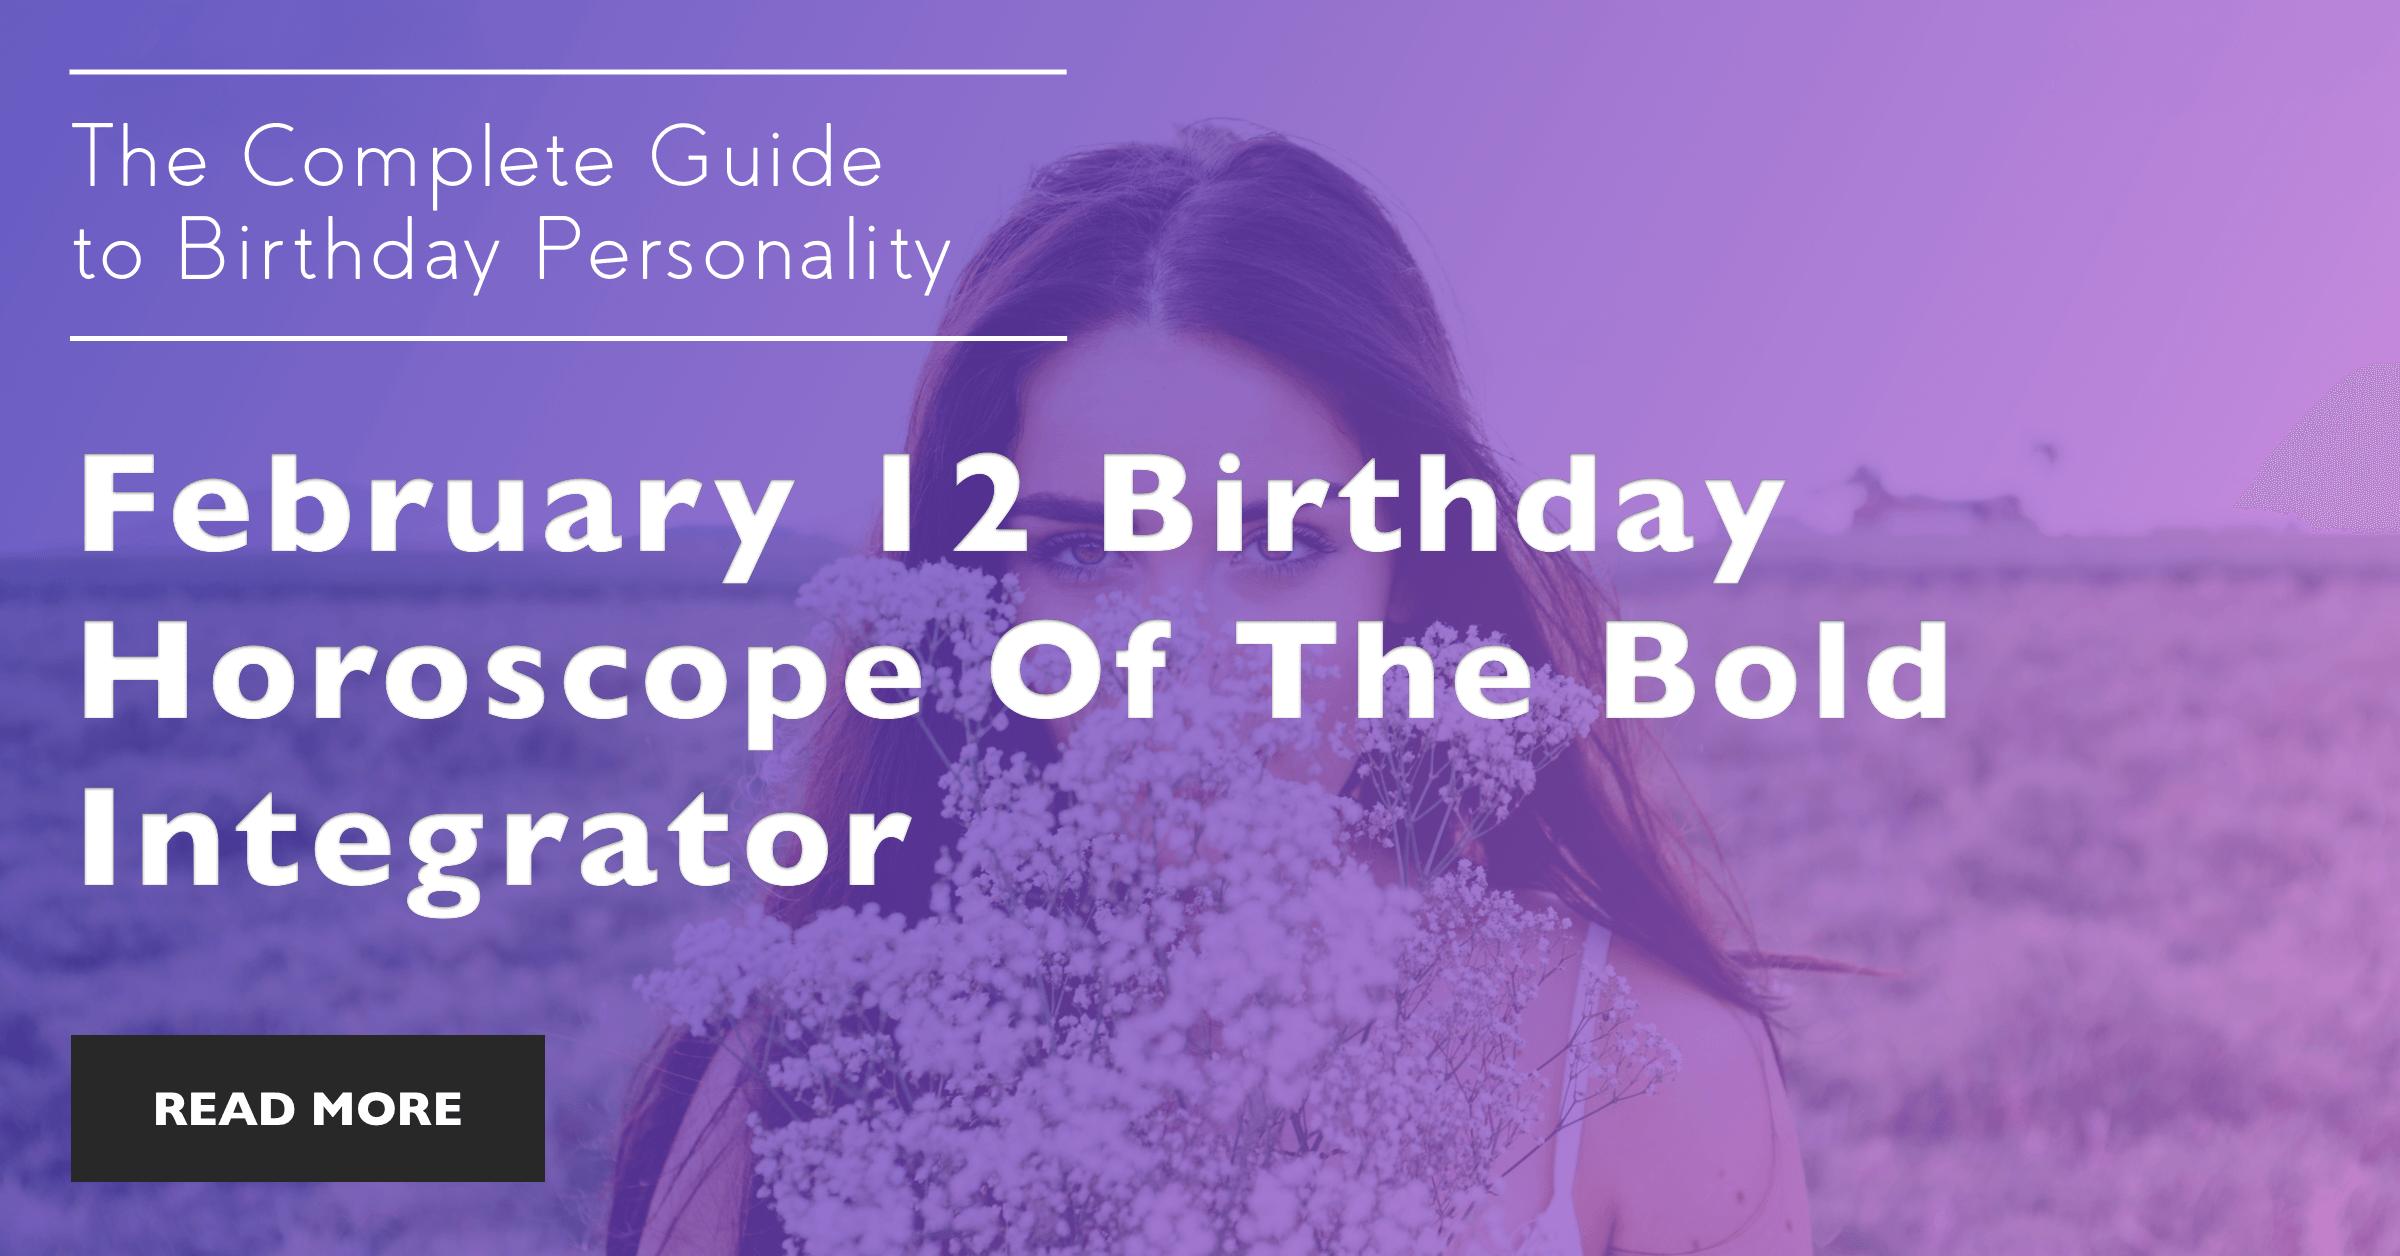 February 12 zodiac graphic freeuse library February 12 Zodiac Birthday Horoscope Personality graphic freeuse library